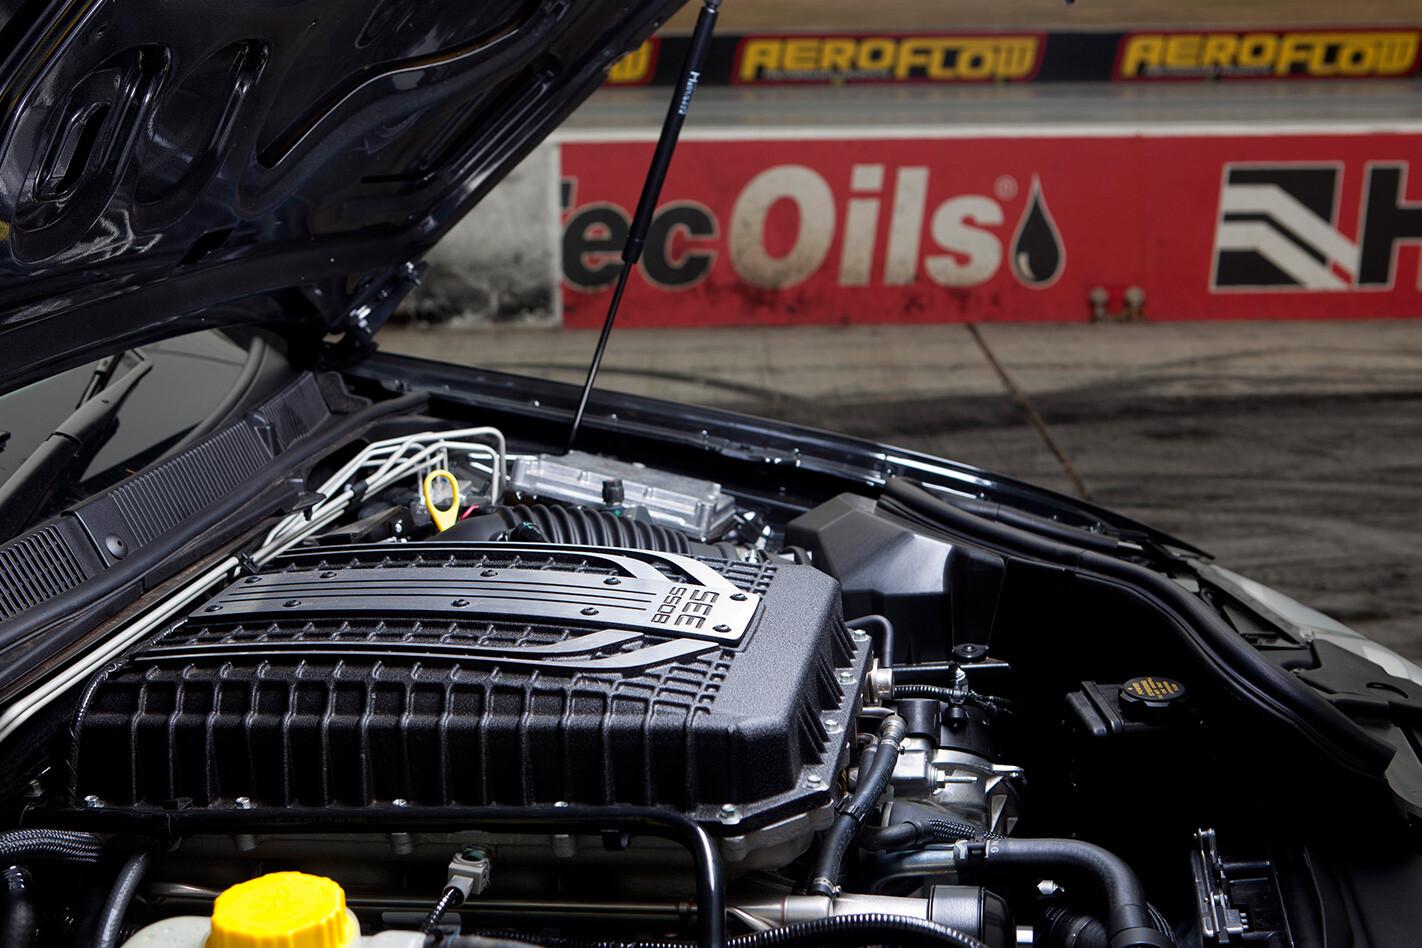 2012-FPV-GT-RSPEC-engine.jpg